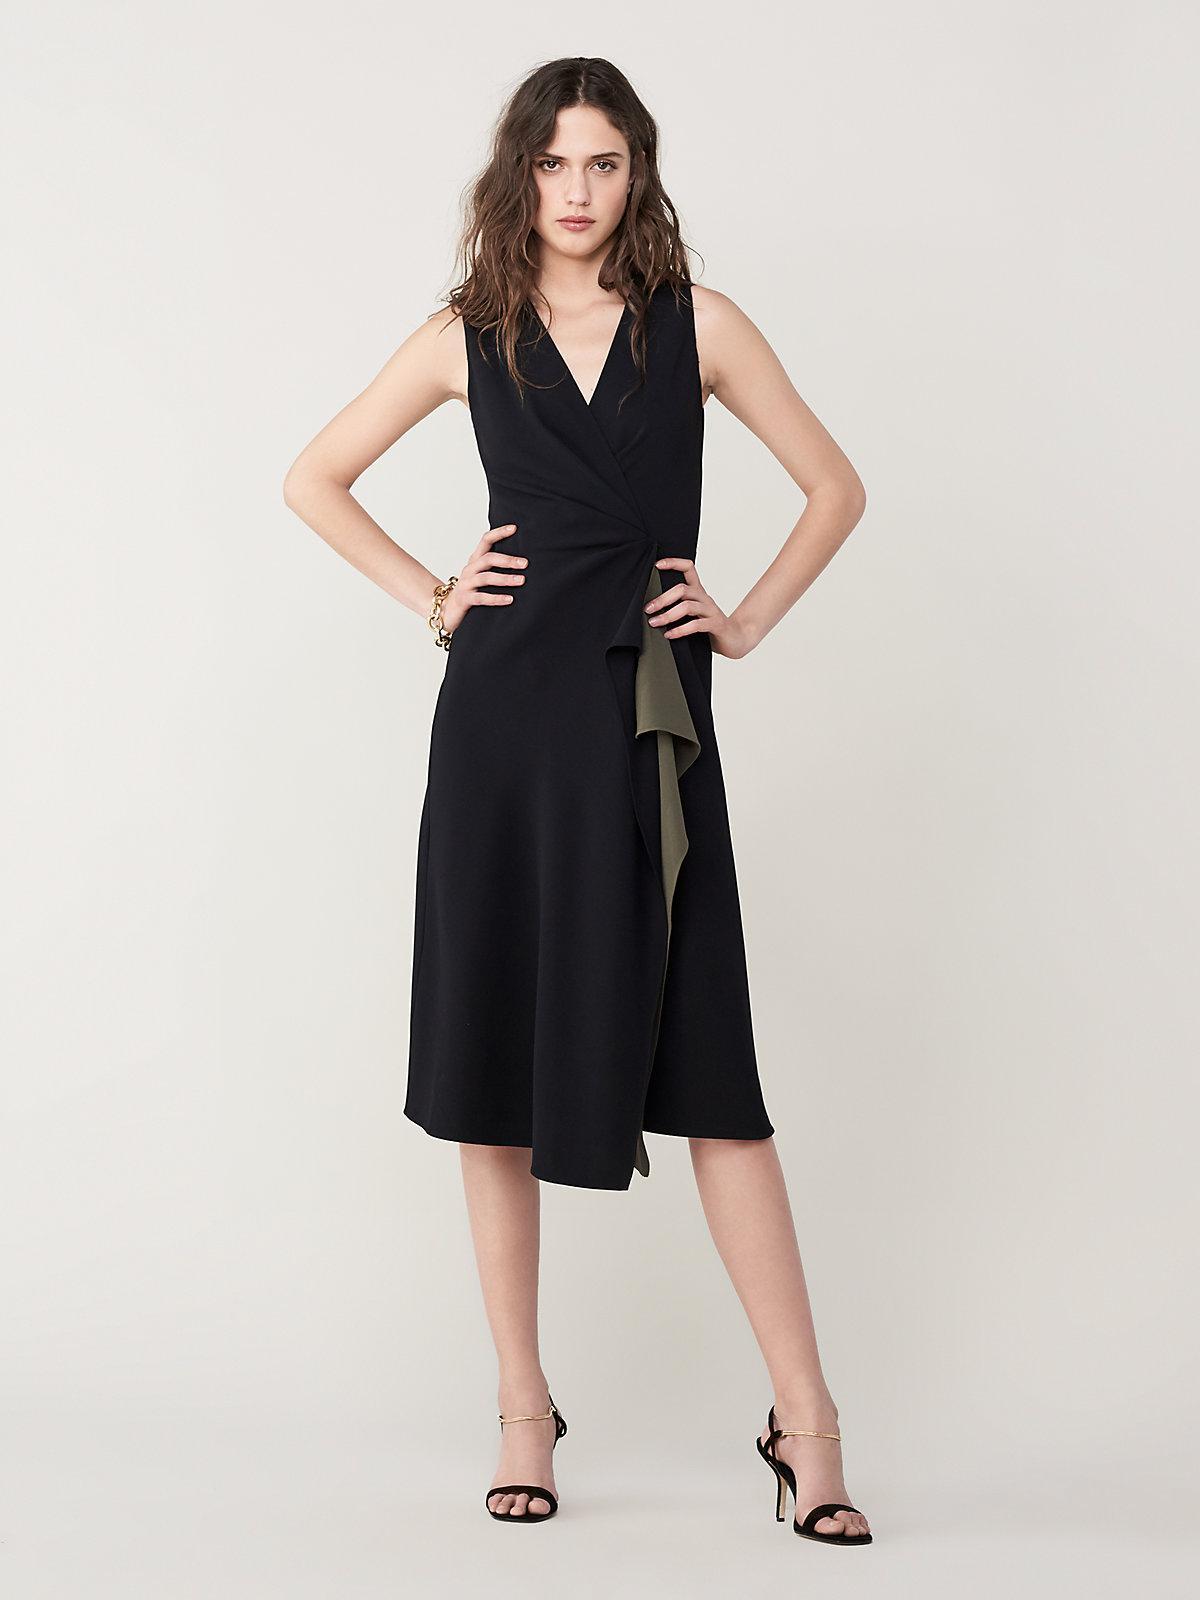 4f79e54a1ec Diane von Furstenberg Addison A-line Midi Dress in Black - Lyst